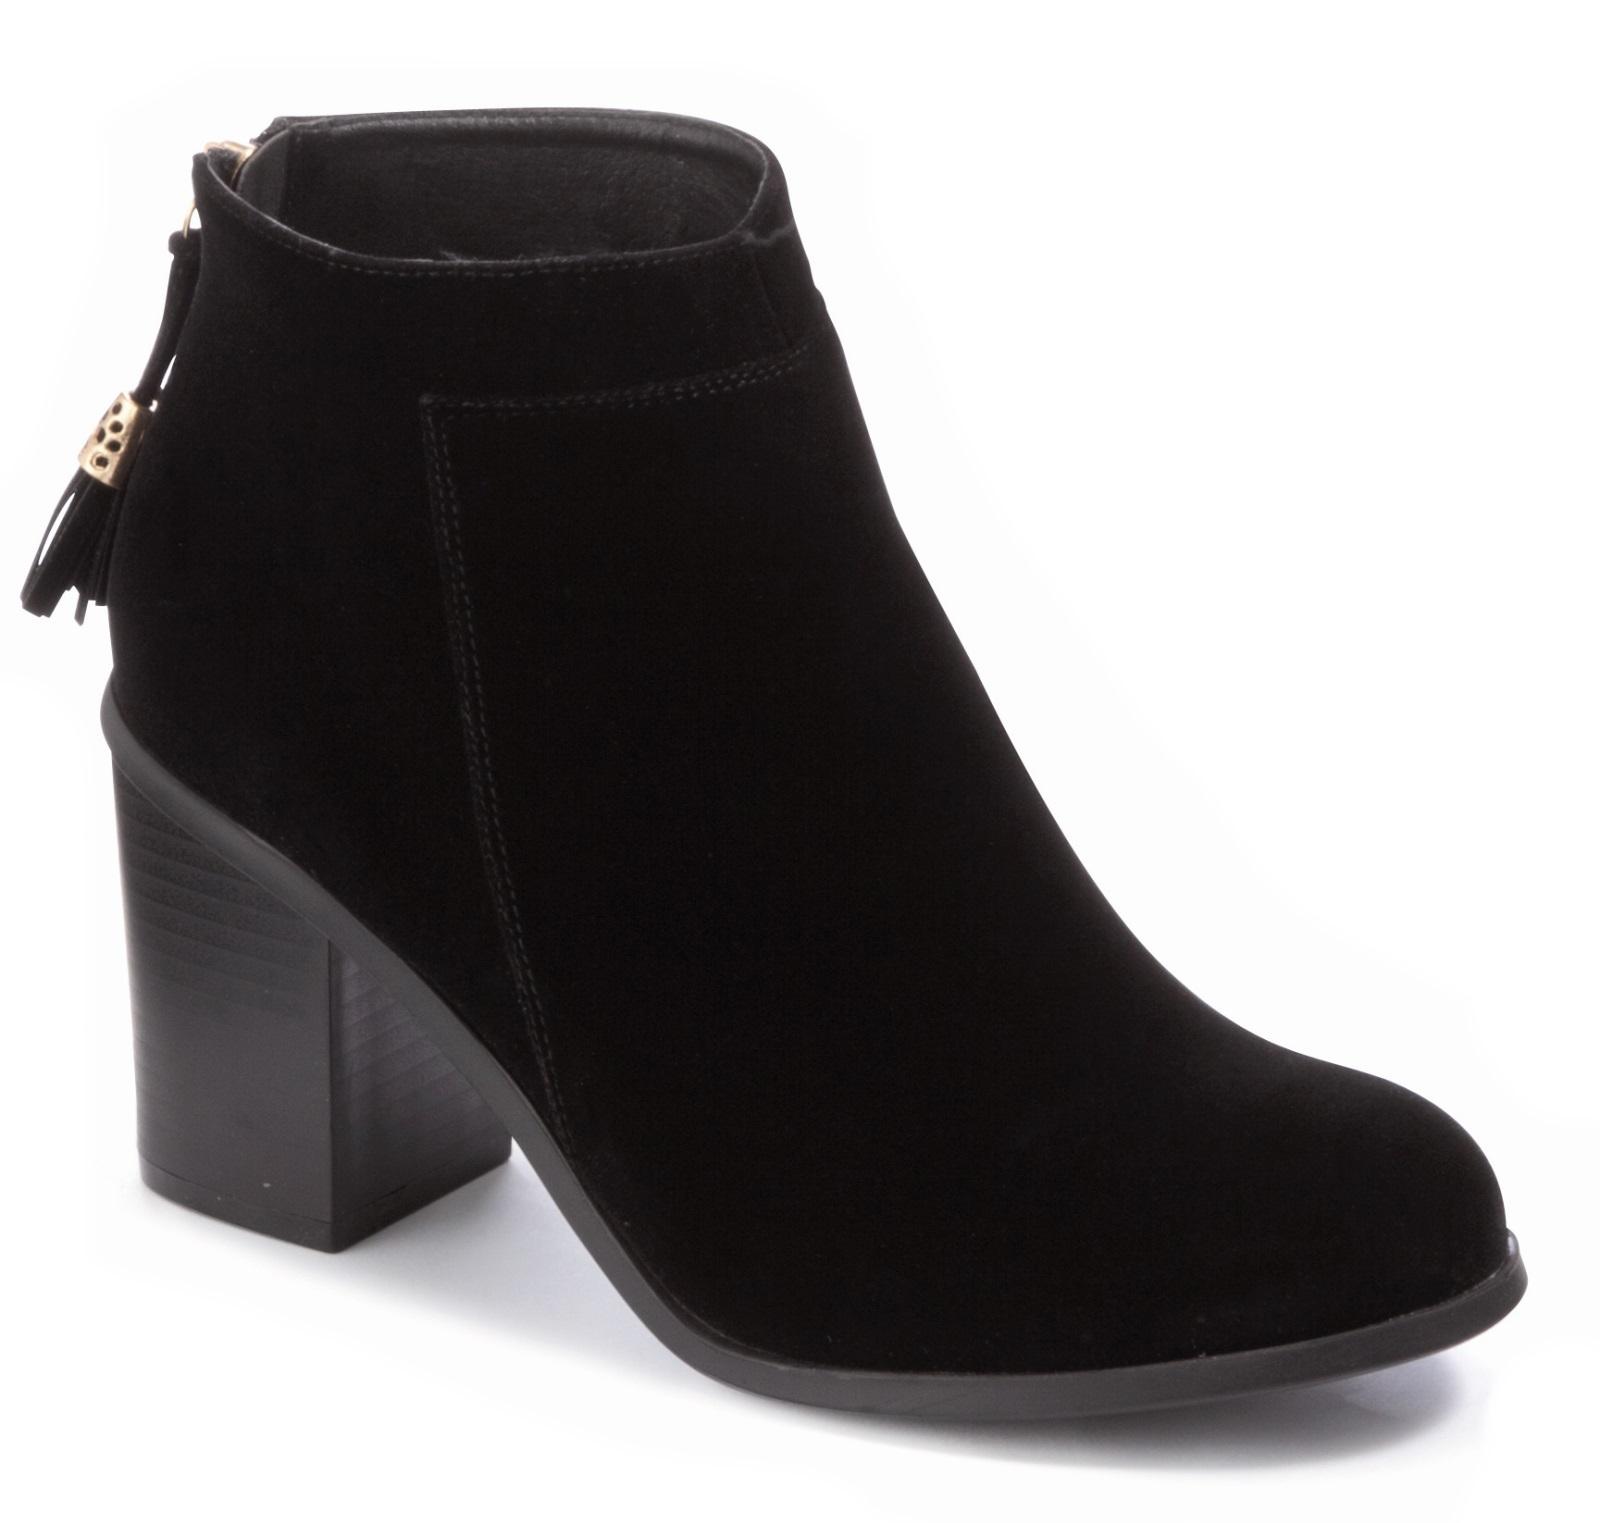 Womens Black Ankle Boots Comfortable Block Heels Chelsea Faux ... bdf5db399e